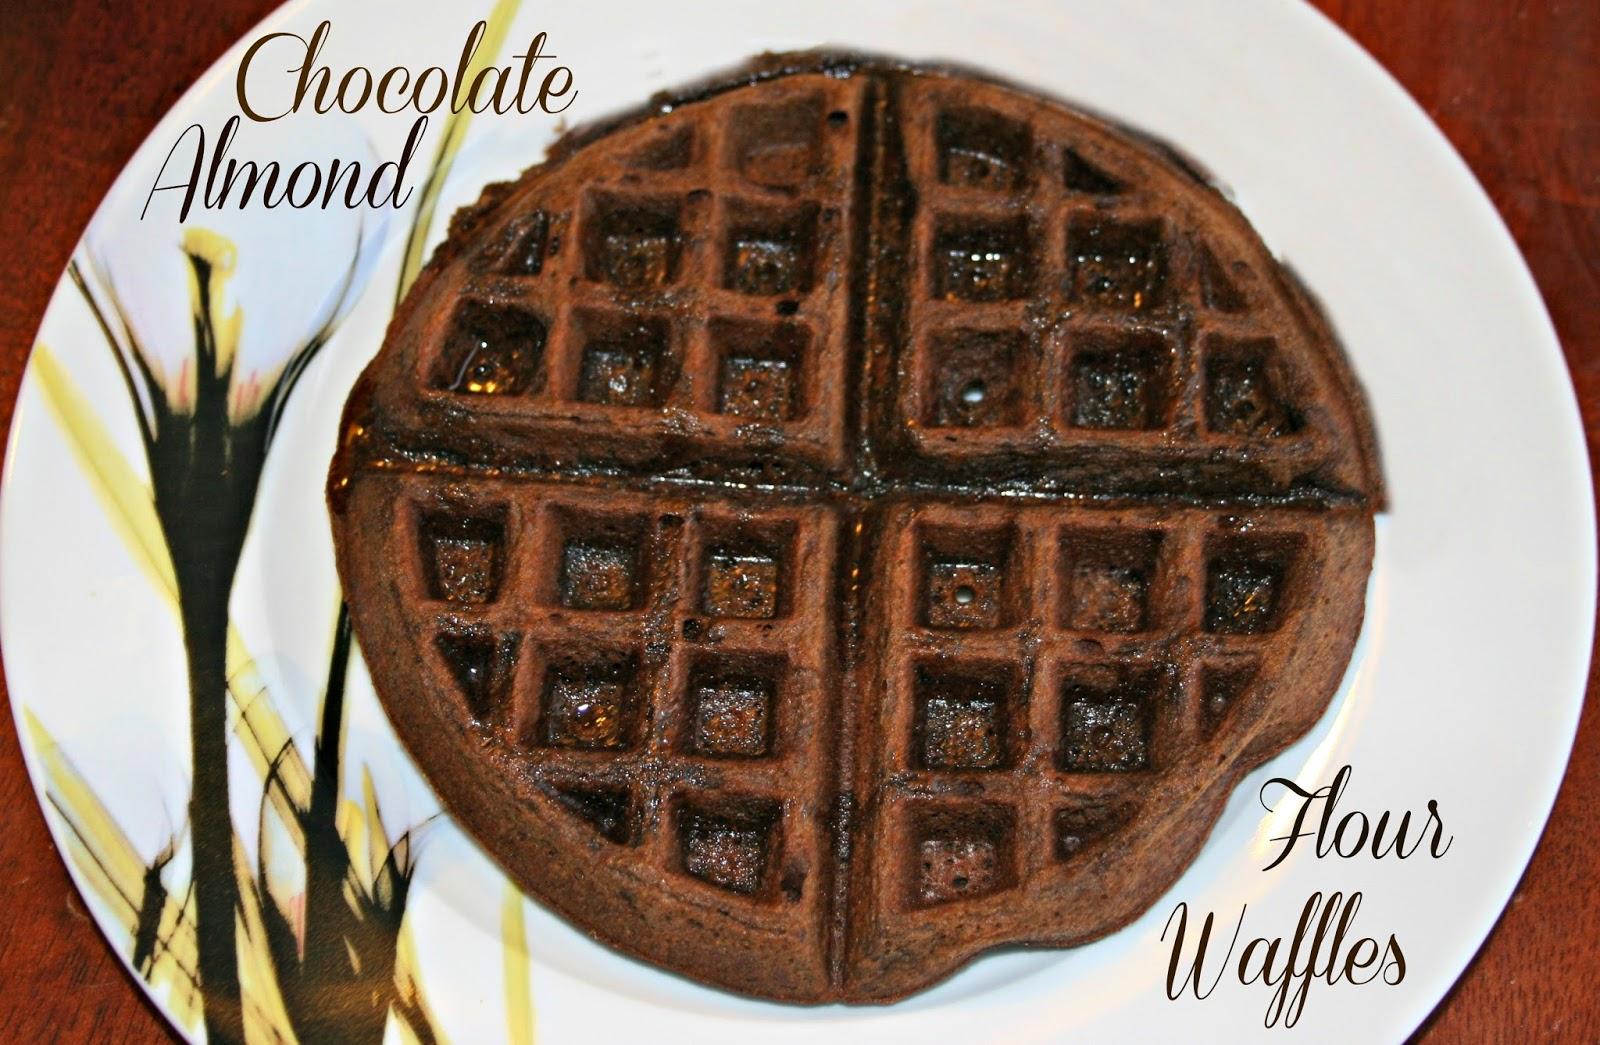 Chocolate Almond Flour Waffles